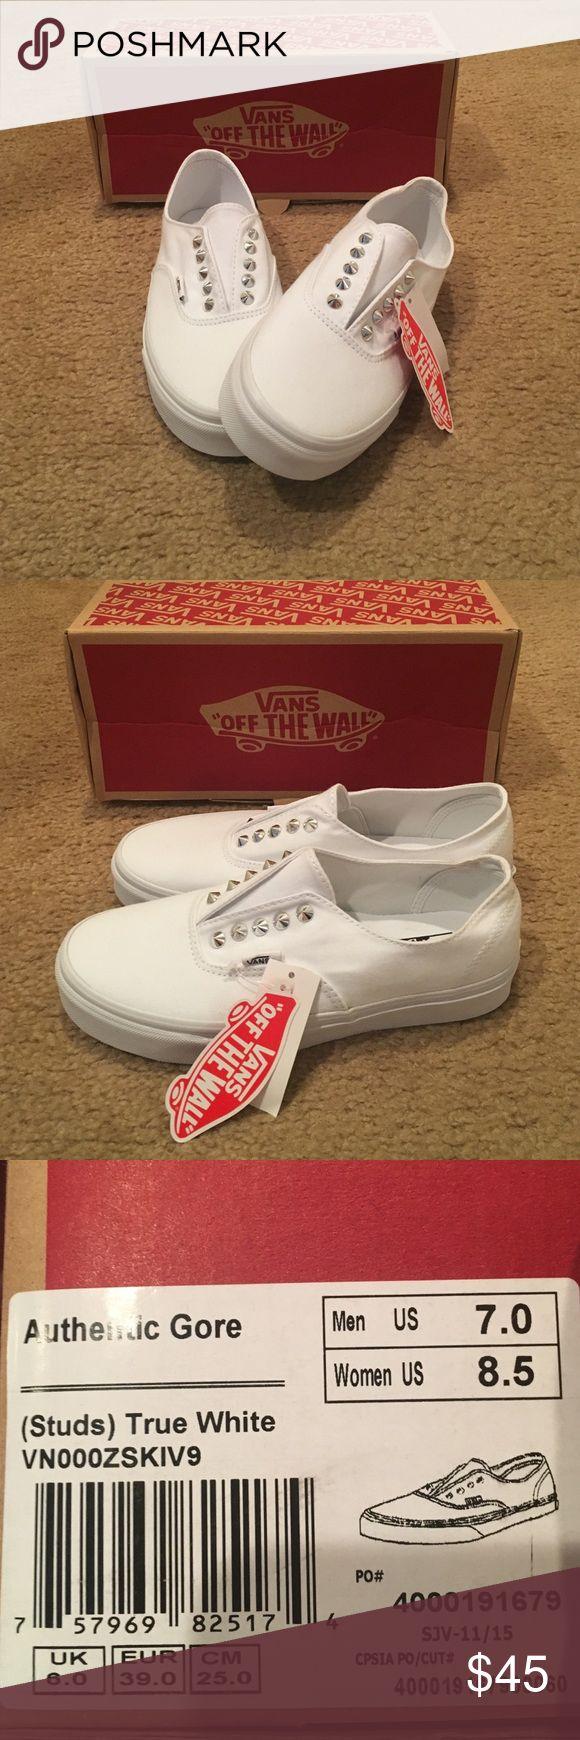 Authentic Gore studded Vans Unisex. True white. Silver studs. Vans Shoes Sneakers